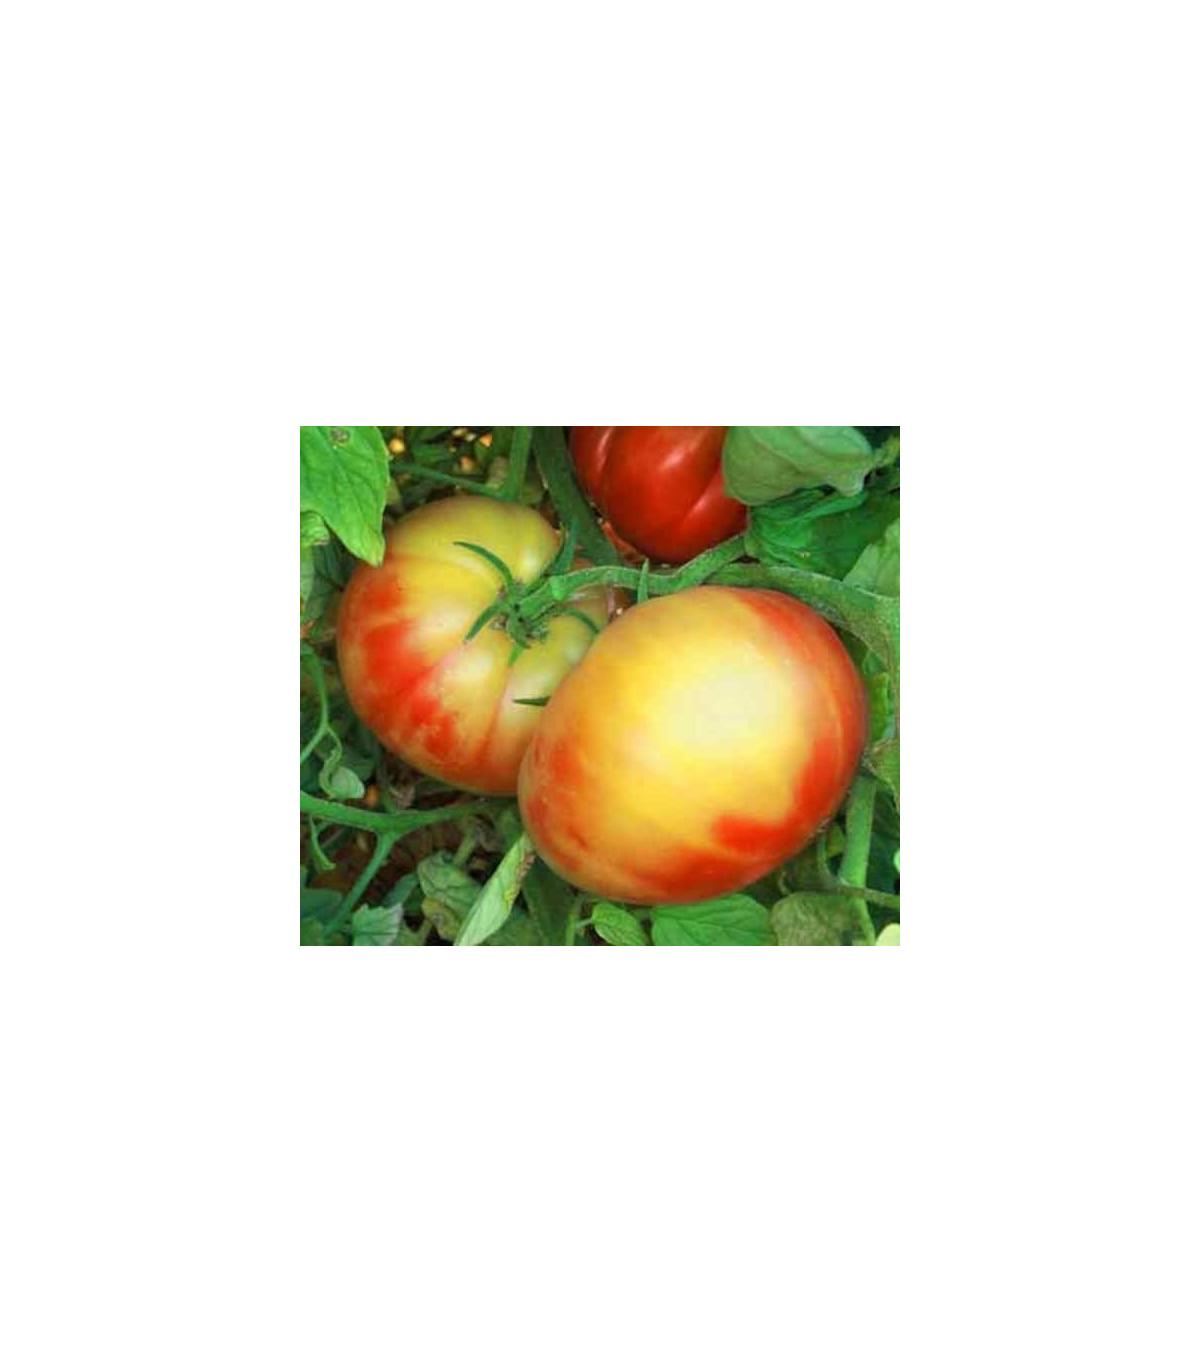 Rajče dvoubarevné - semena rajčete - 6 ks